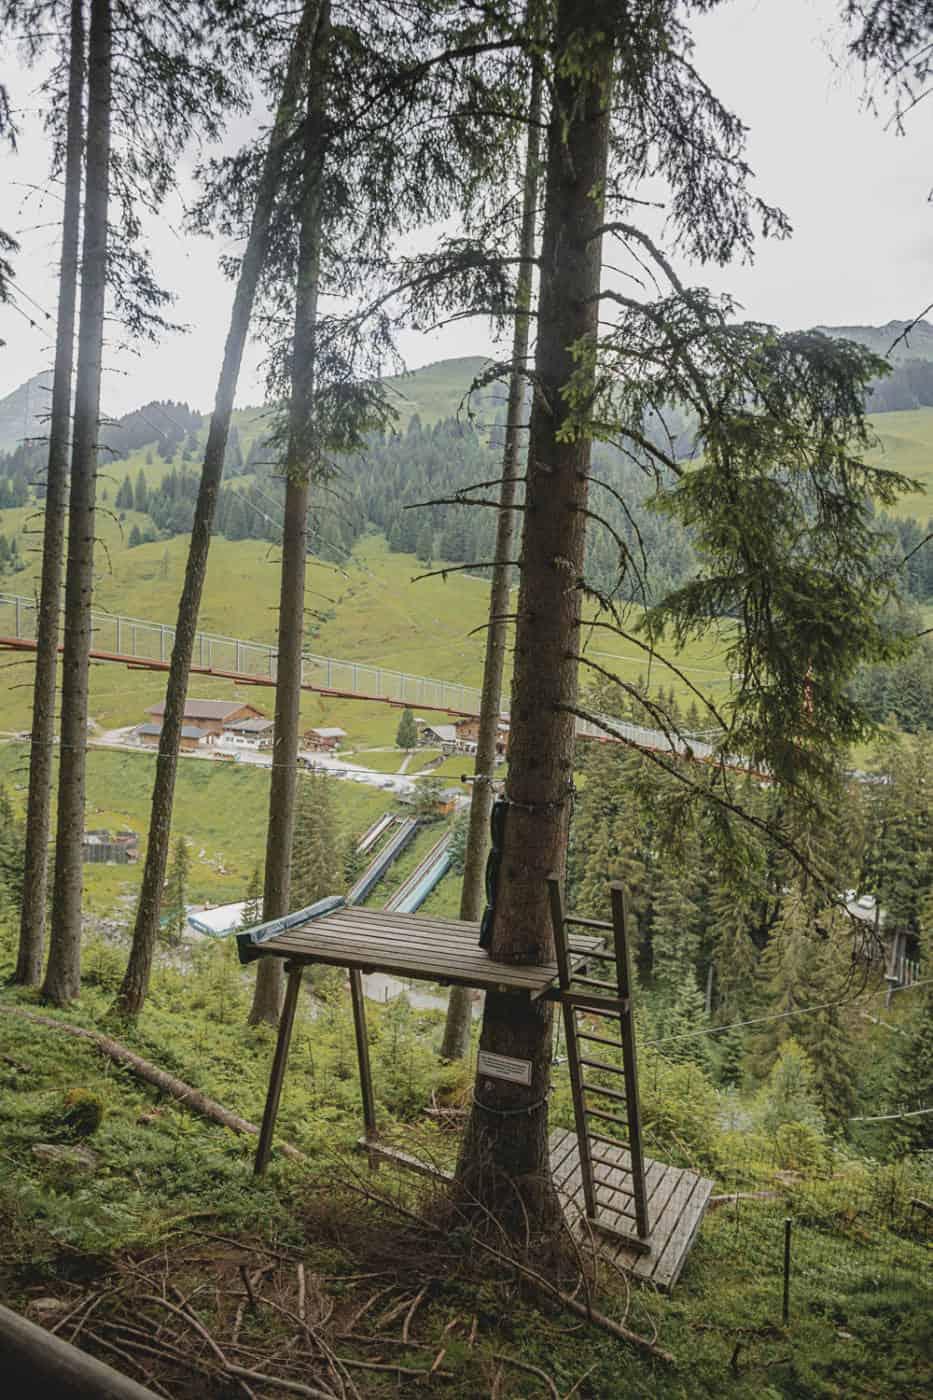 Using the Joker Card on the Treetop Trail in Saalbach Hinterglemm Austria